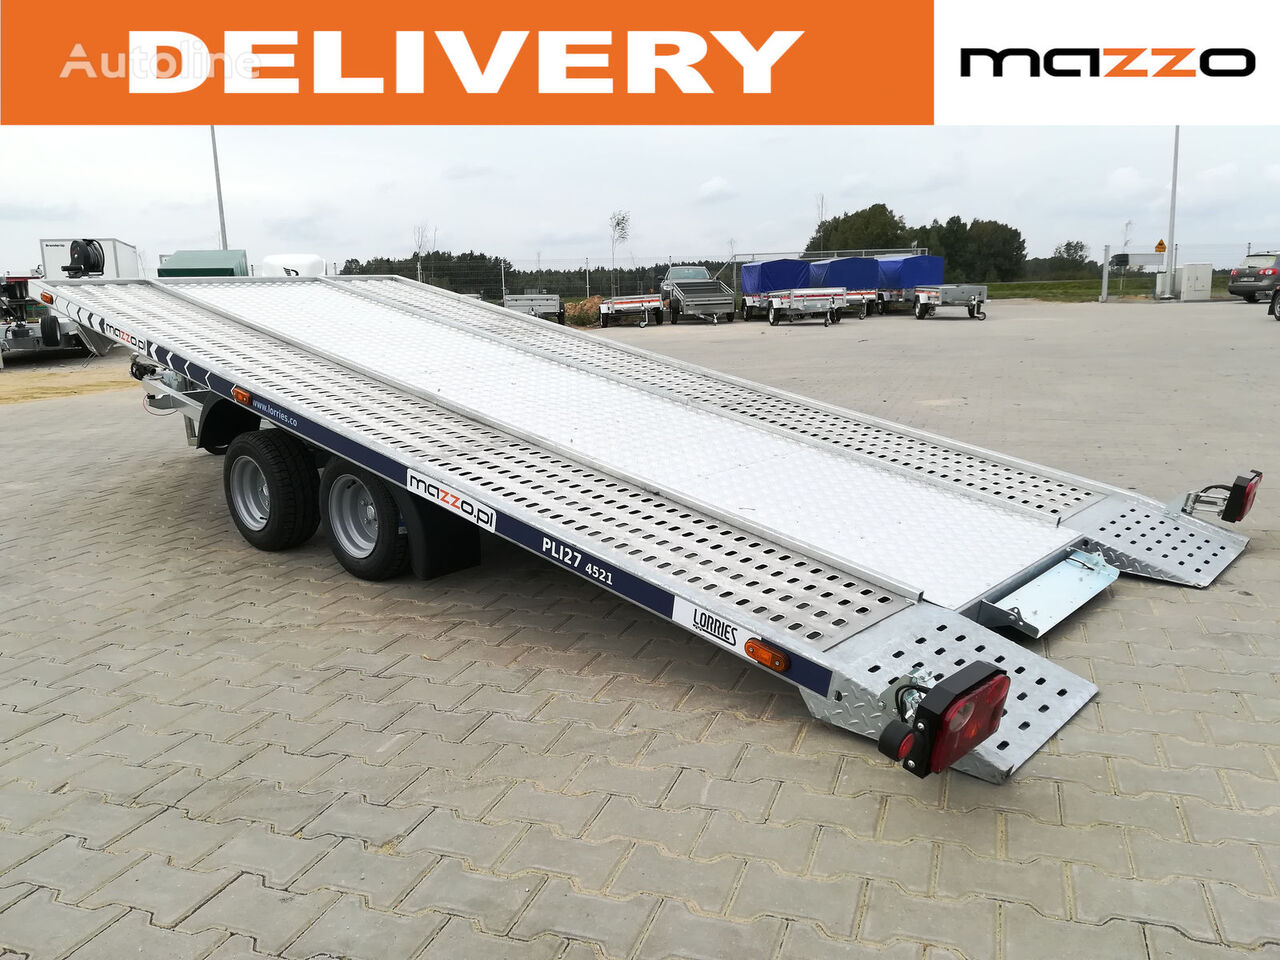 new PLI30-5021 500x210cm car transporter trailer